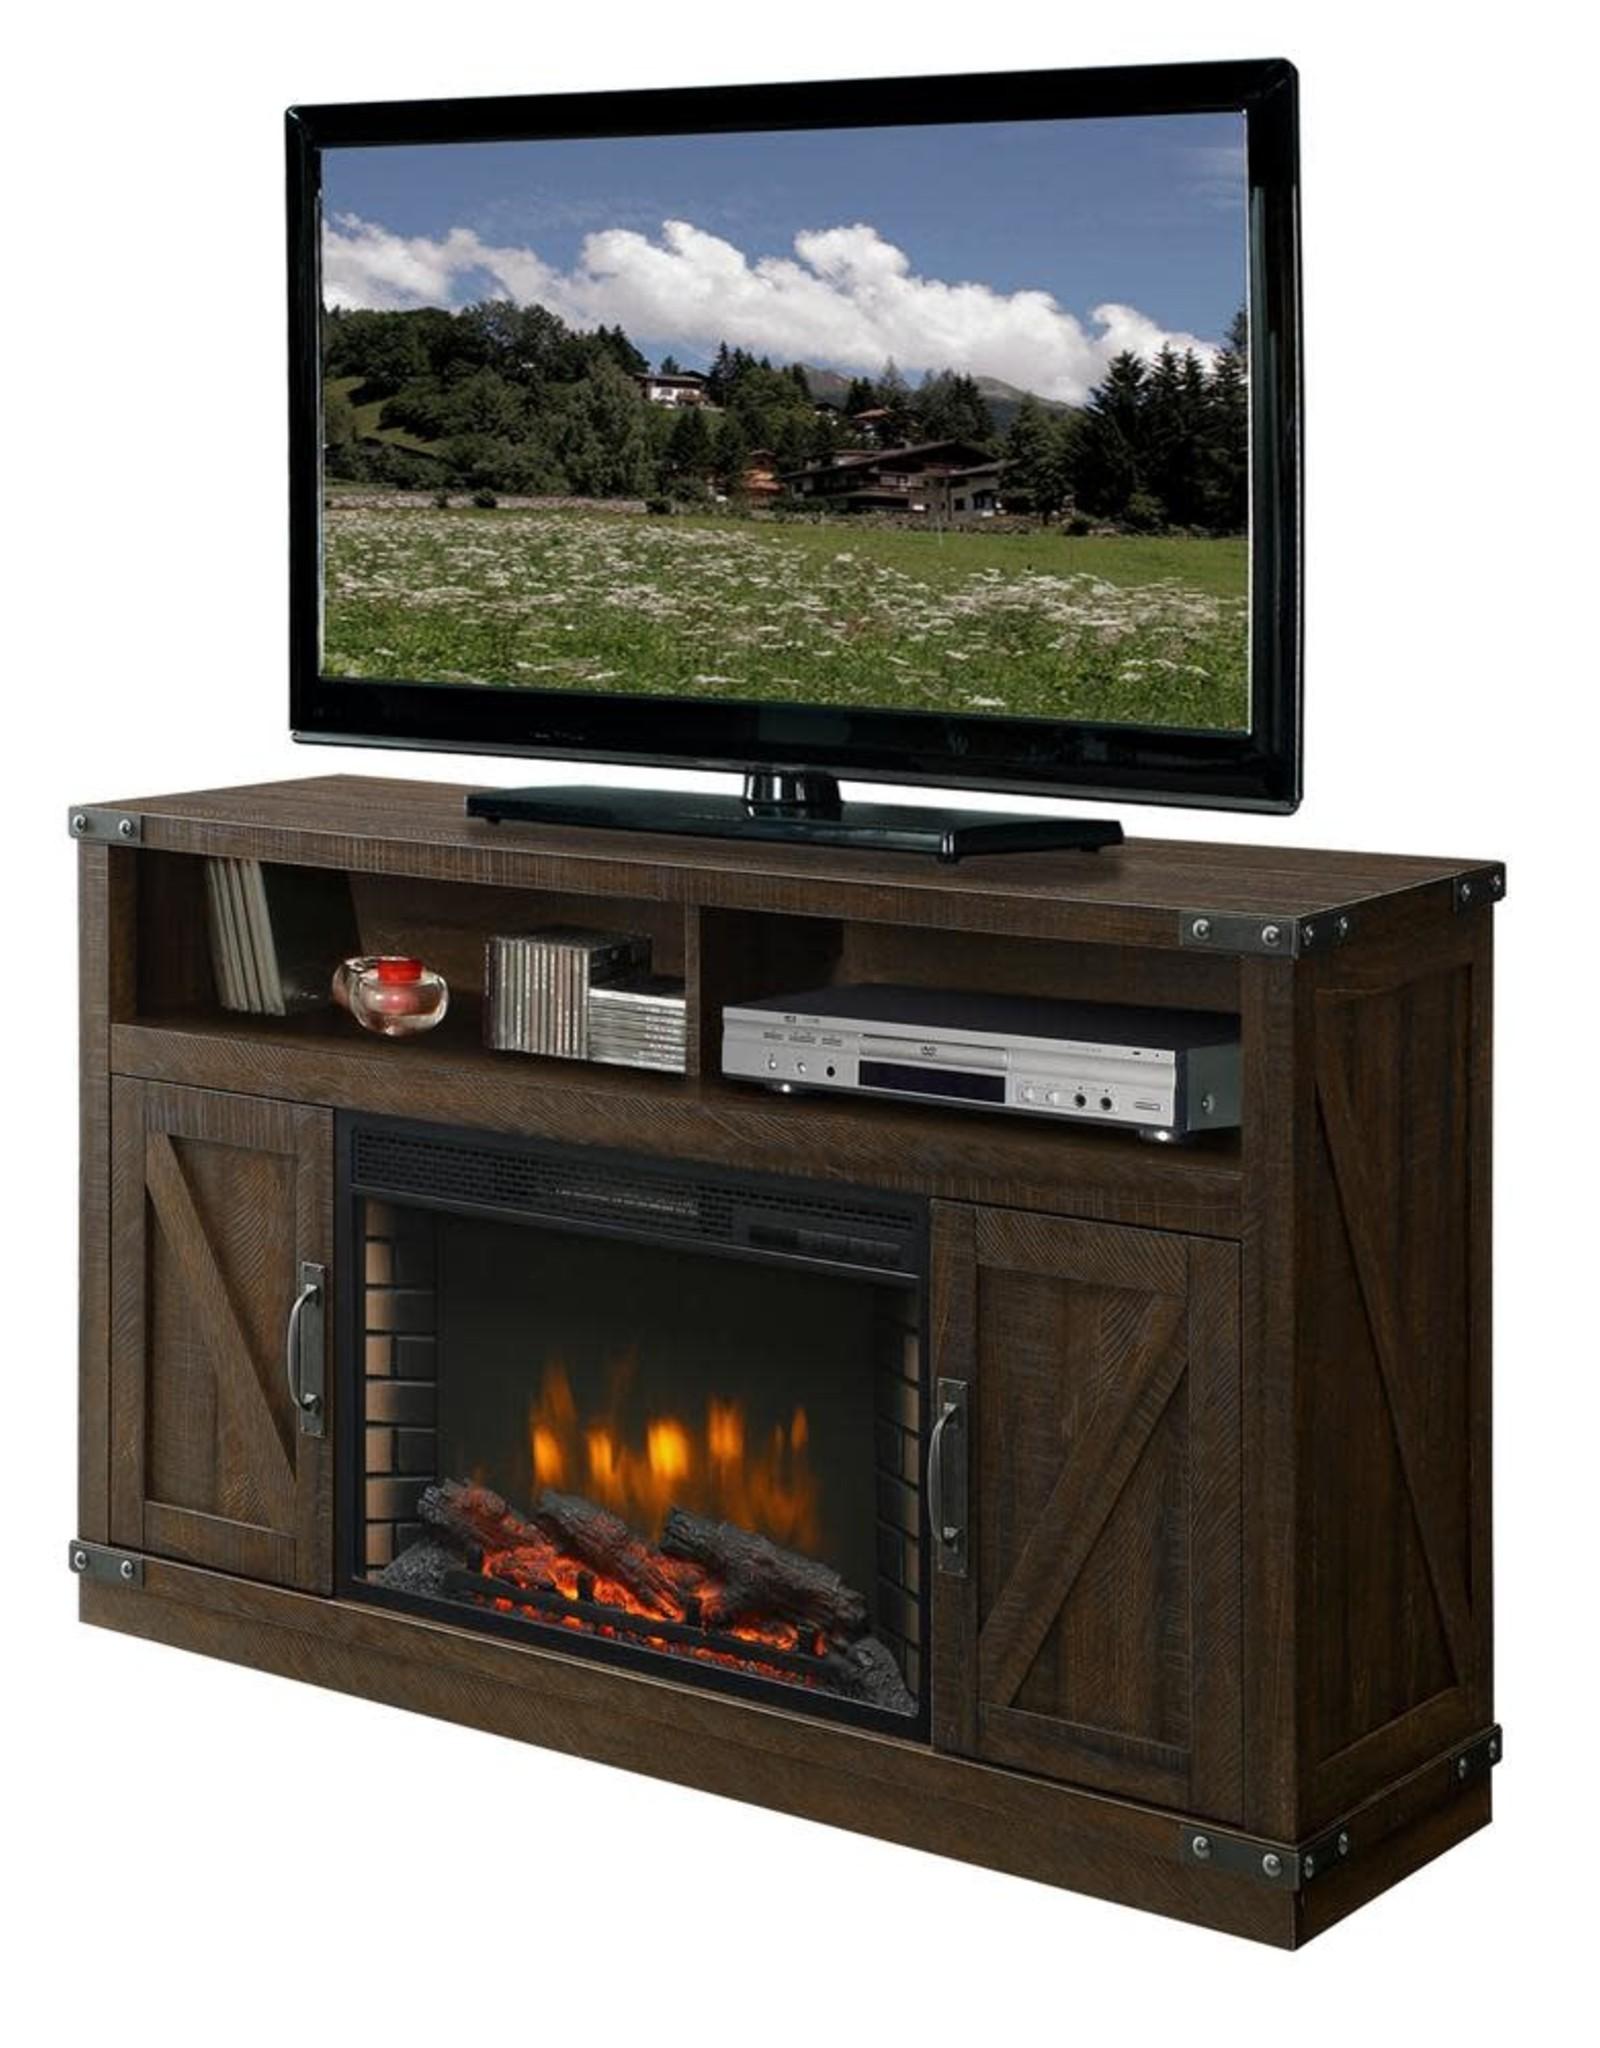 Muskoka Aberfoyle 53 in. Freestanding Electric Fireplace TV Stand in Rustic Brown